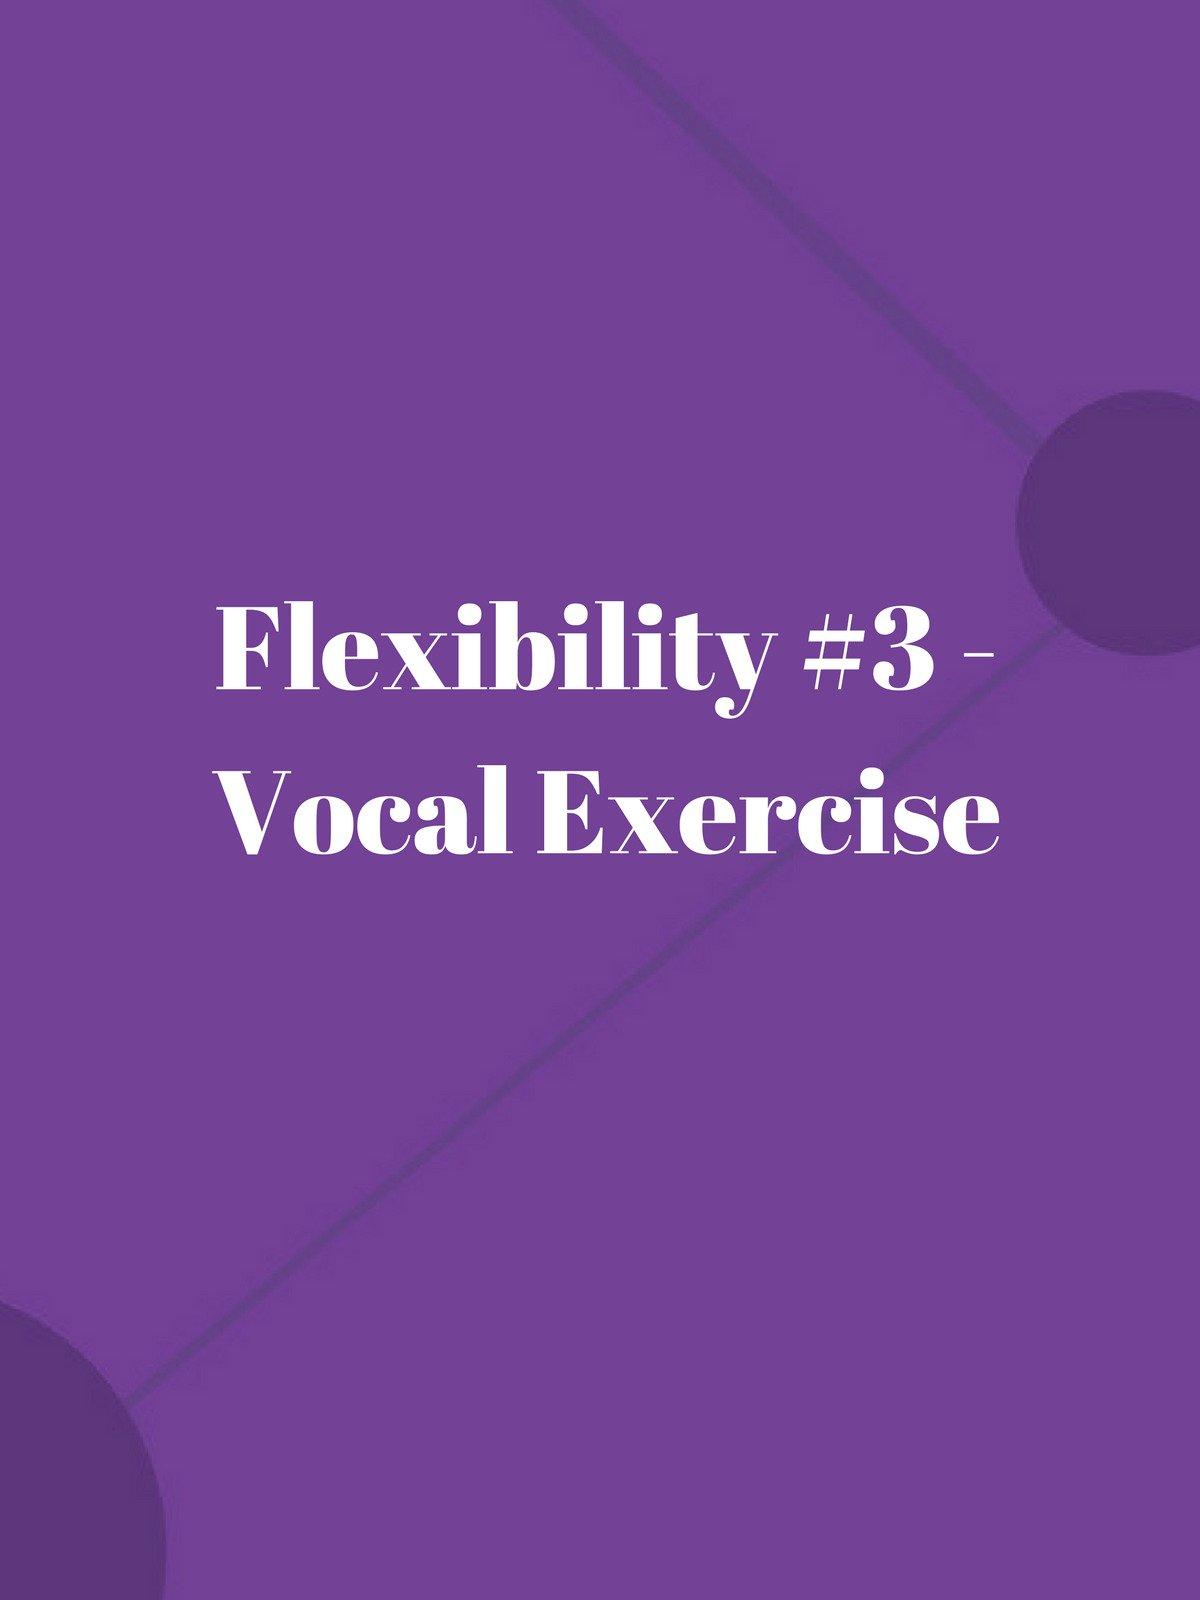 Flexibility #3